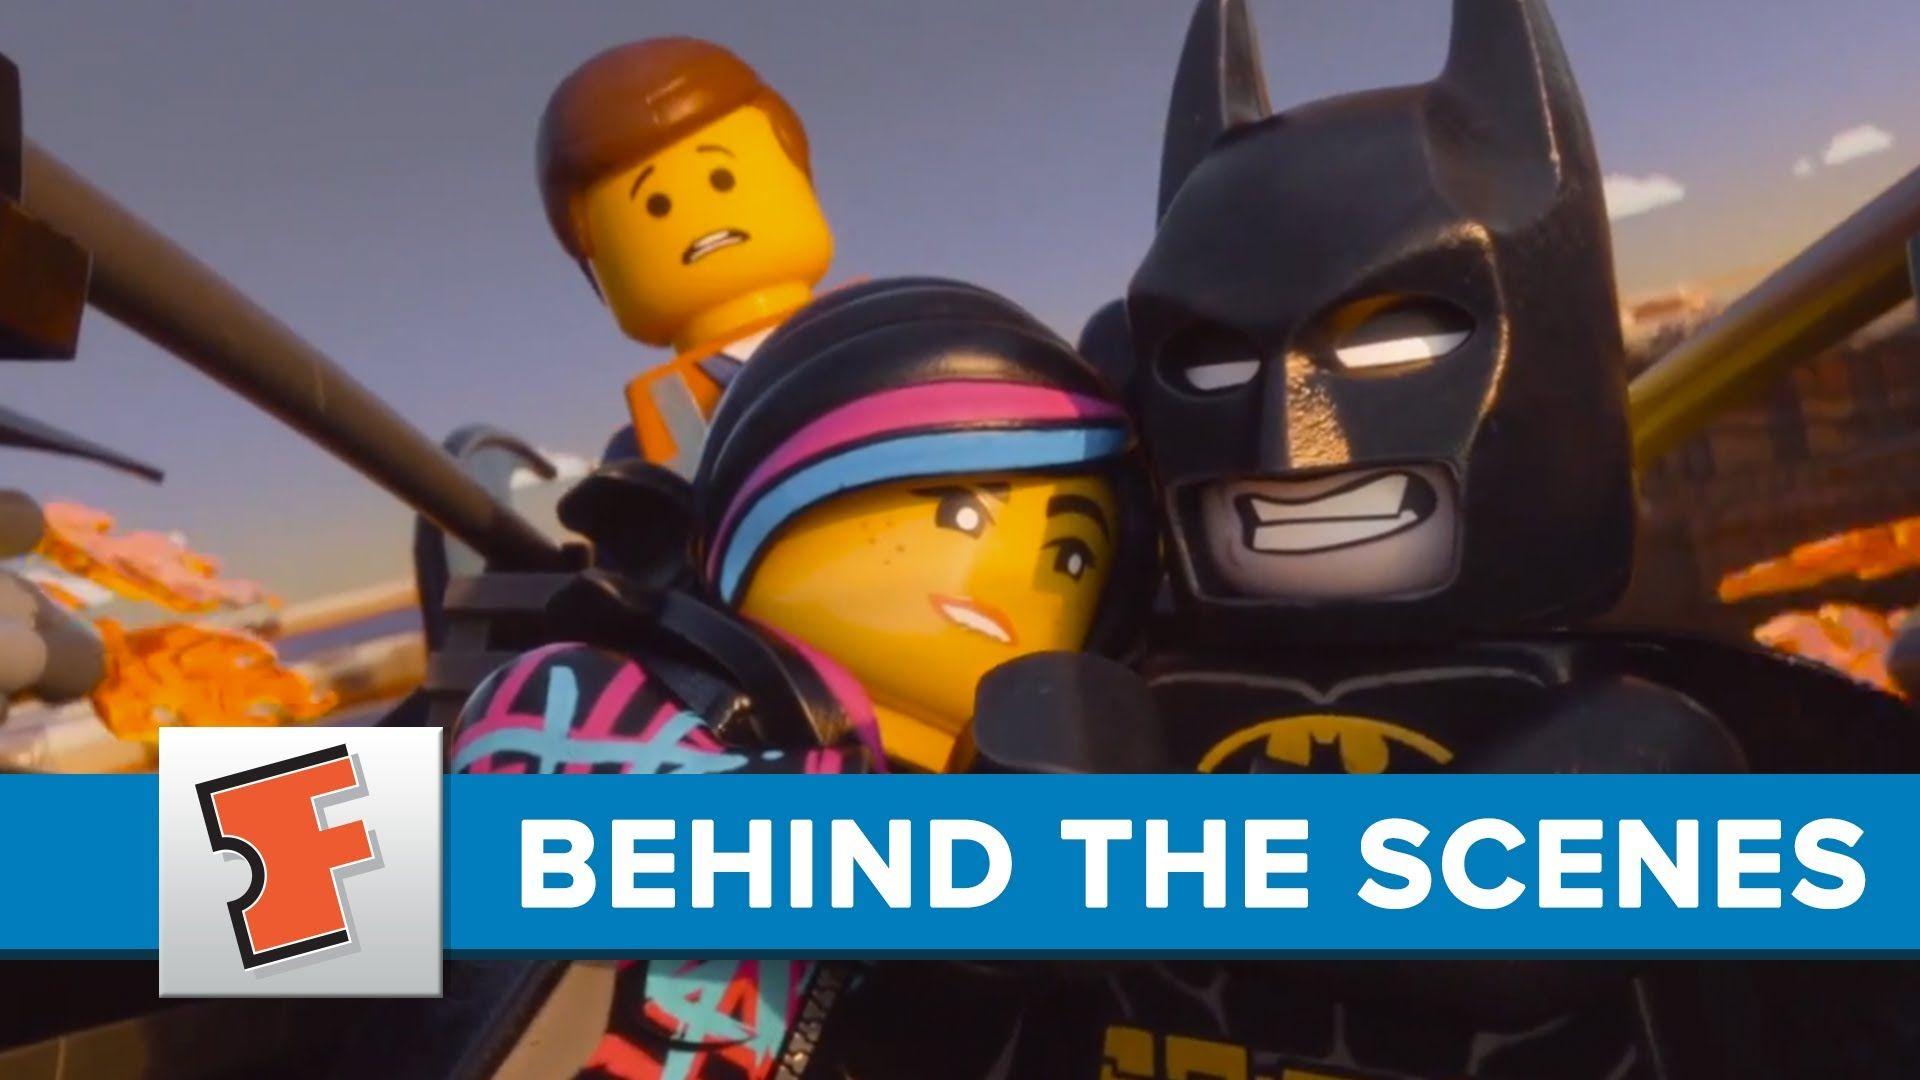 Lego Outtakes Behind the Scenes FandangoMovies Lego